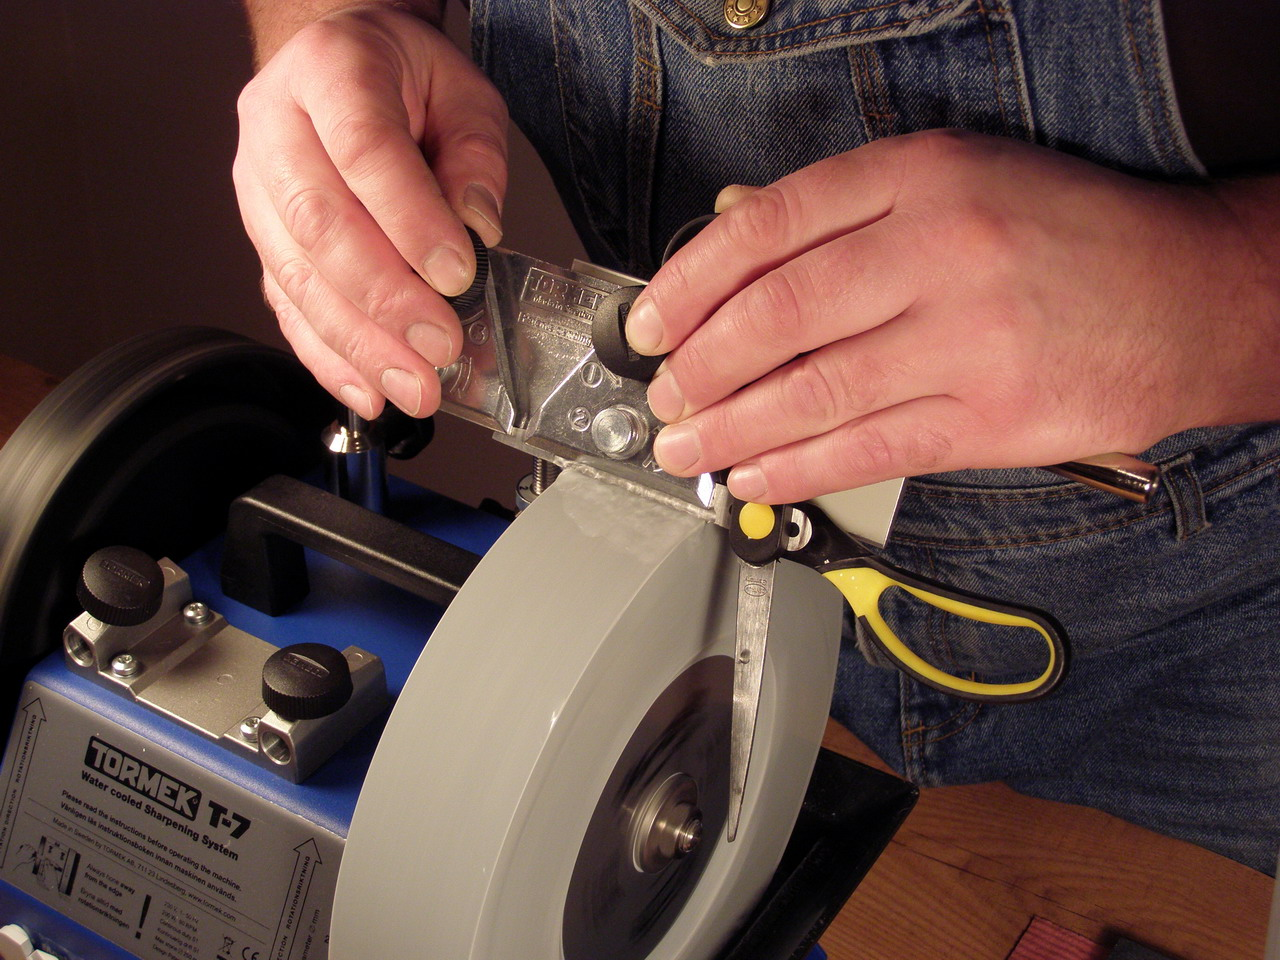 Манипулятор для заточки ножниц своими руками 43